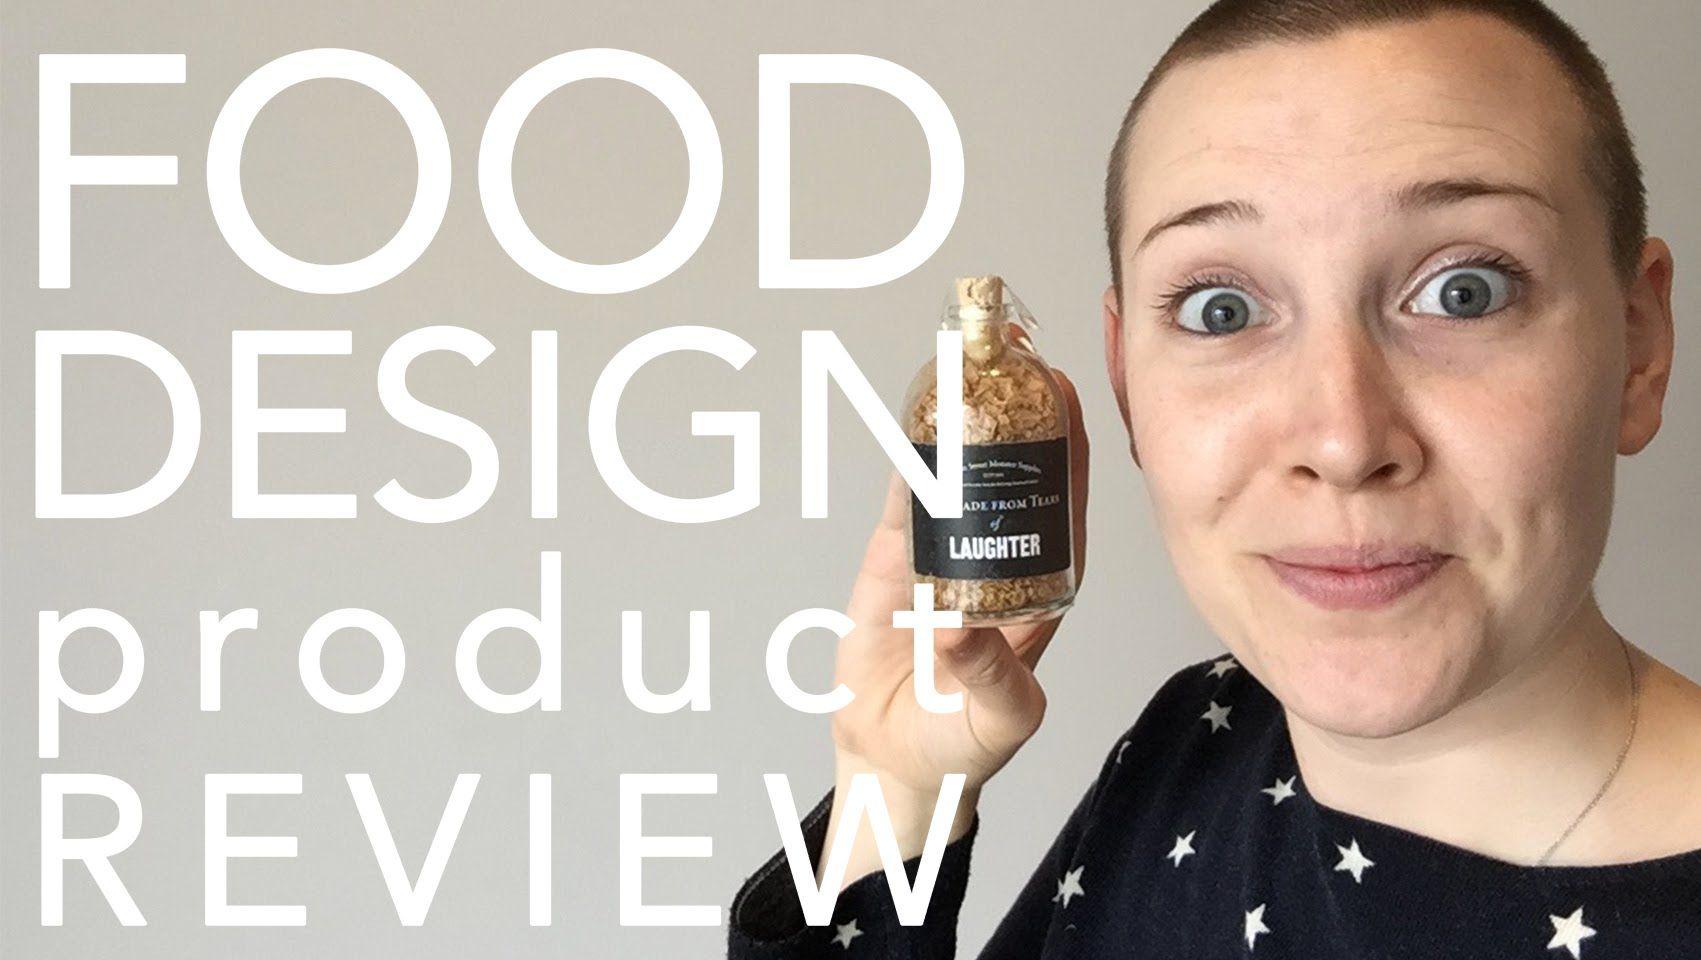 Food Design Product Review: Hoxton Street Monster Supplies' Salt! =) #fooddesign #fooddesignreview